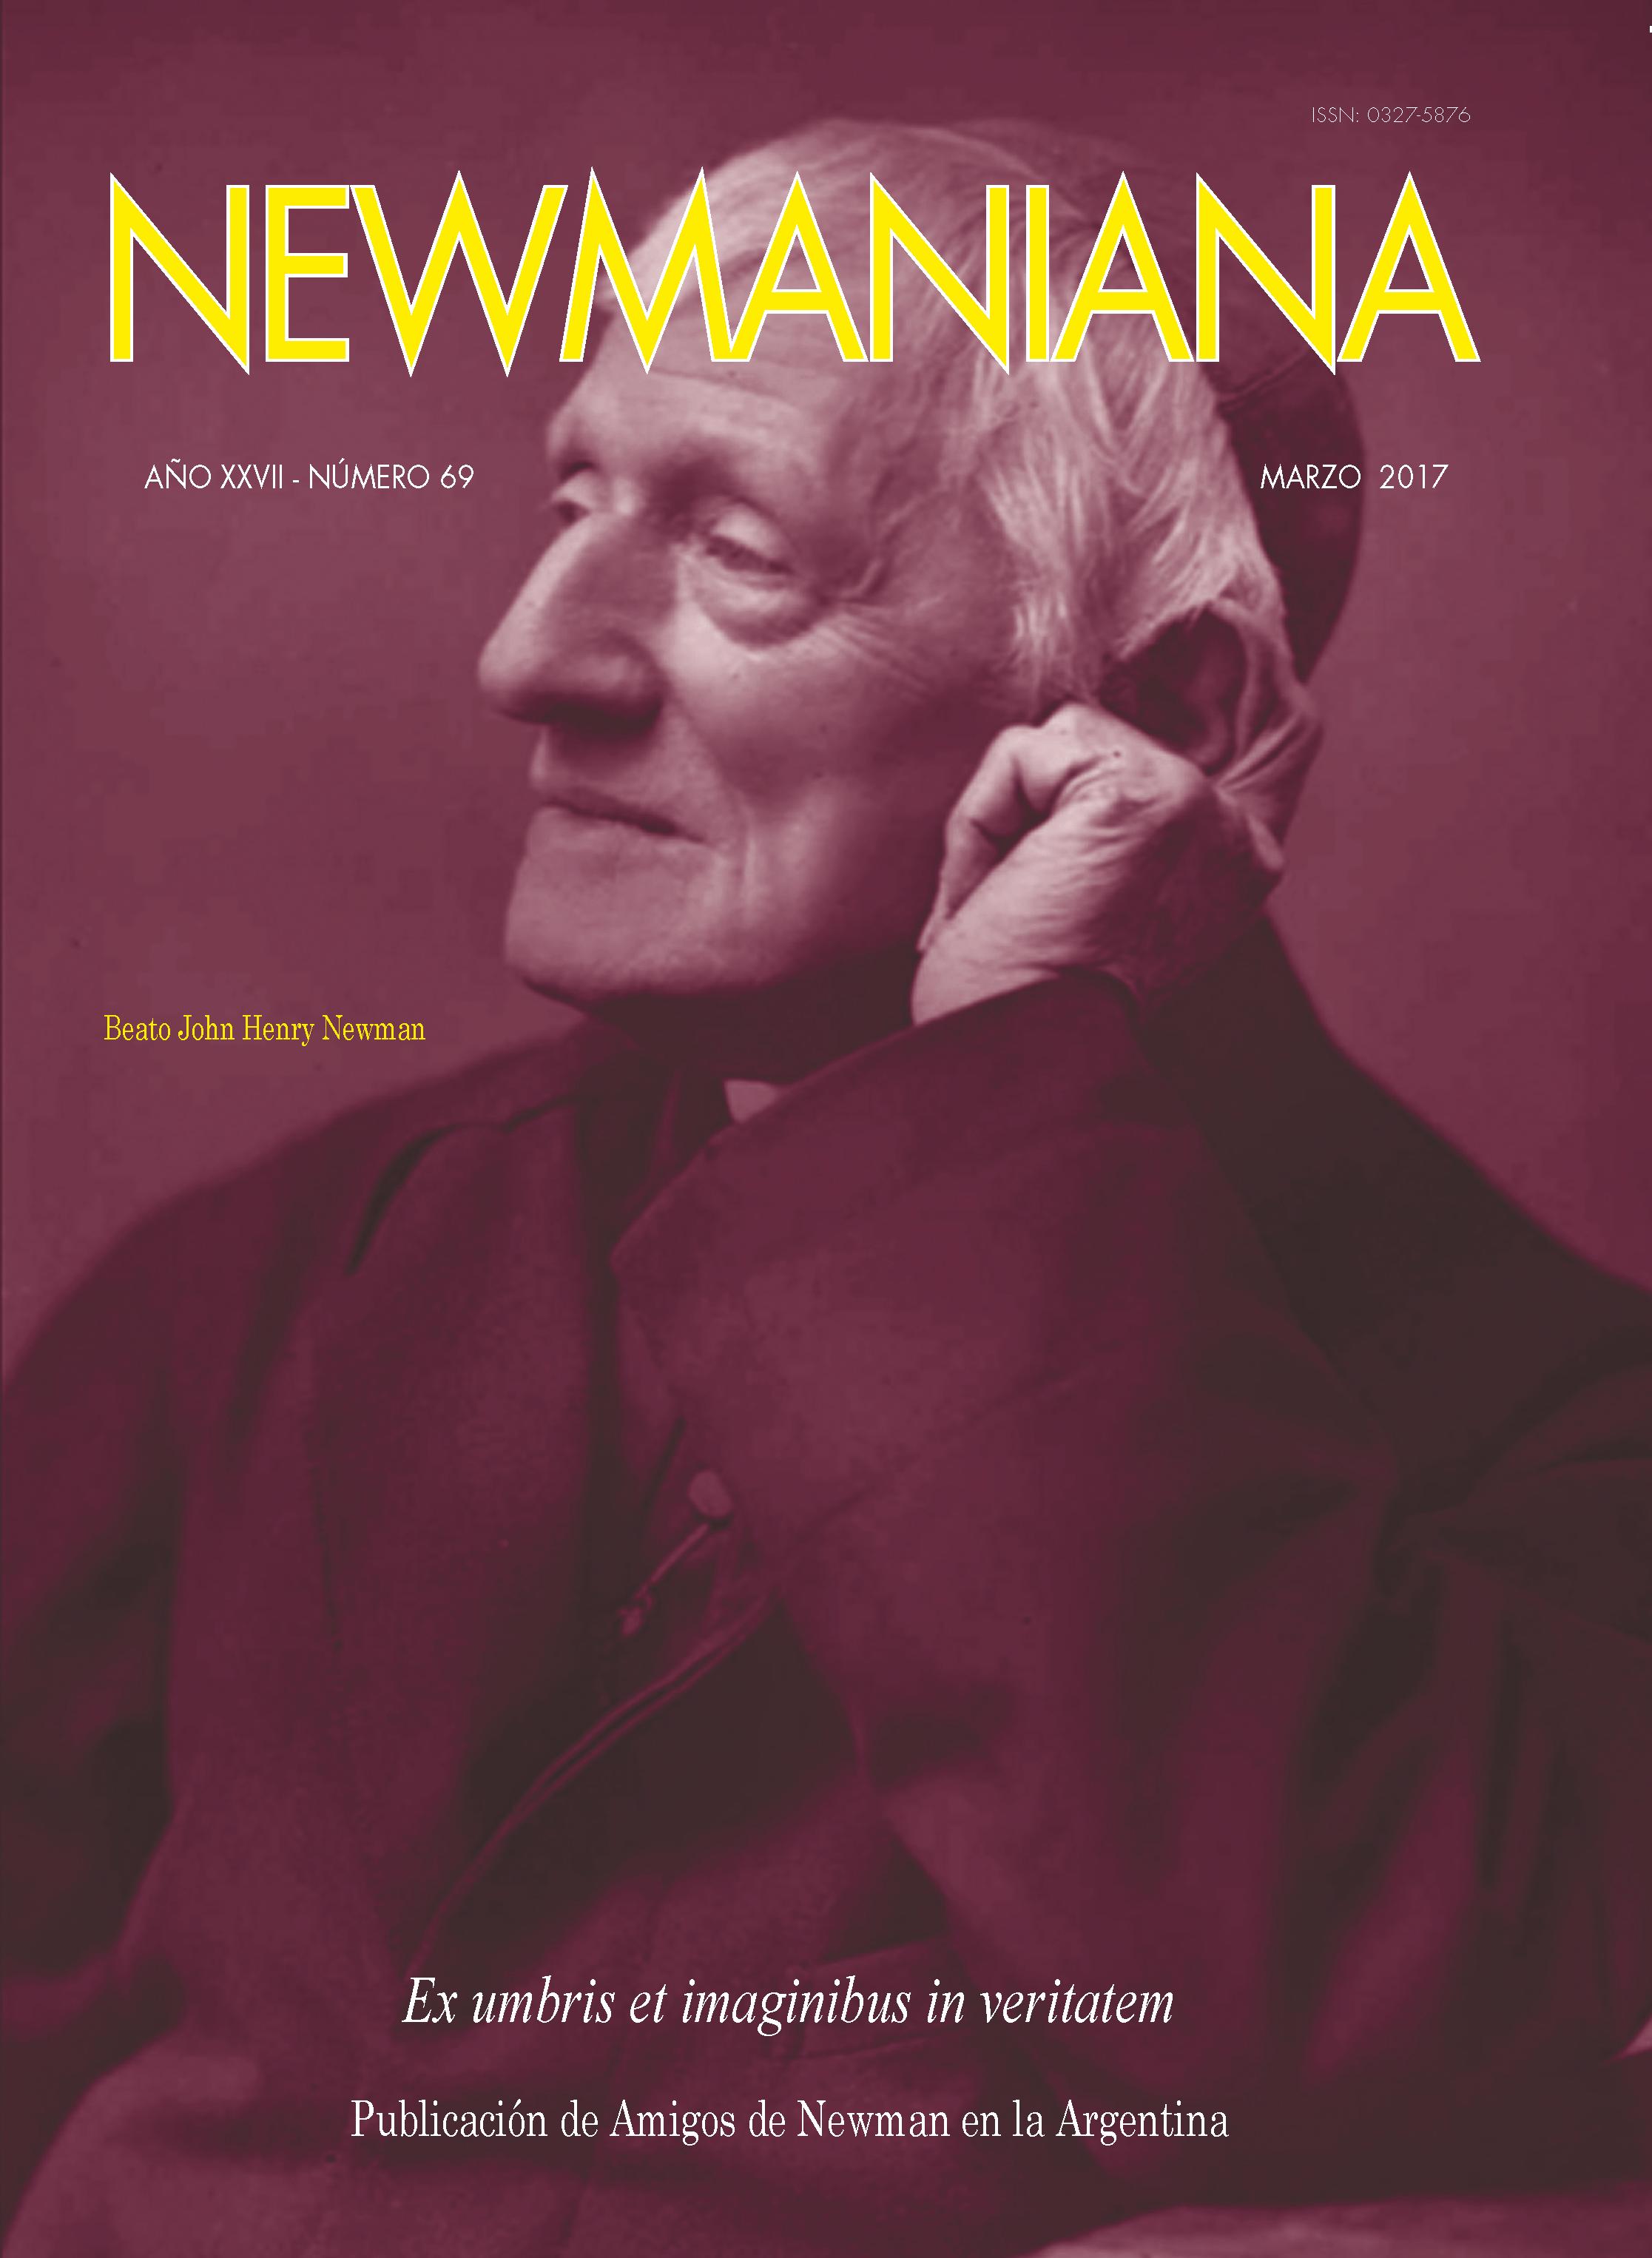 Revista Newmanian N°69 – Marzo 2017